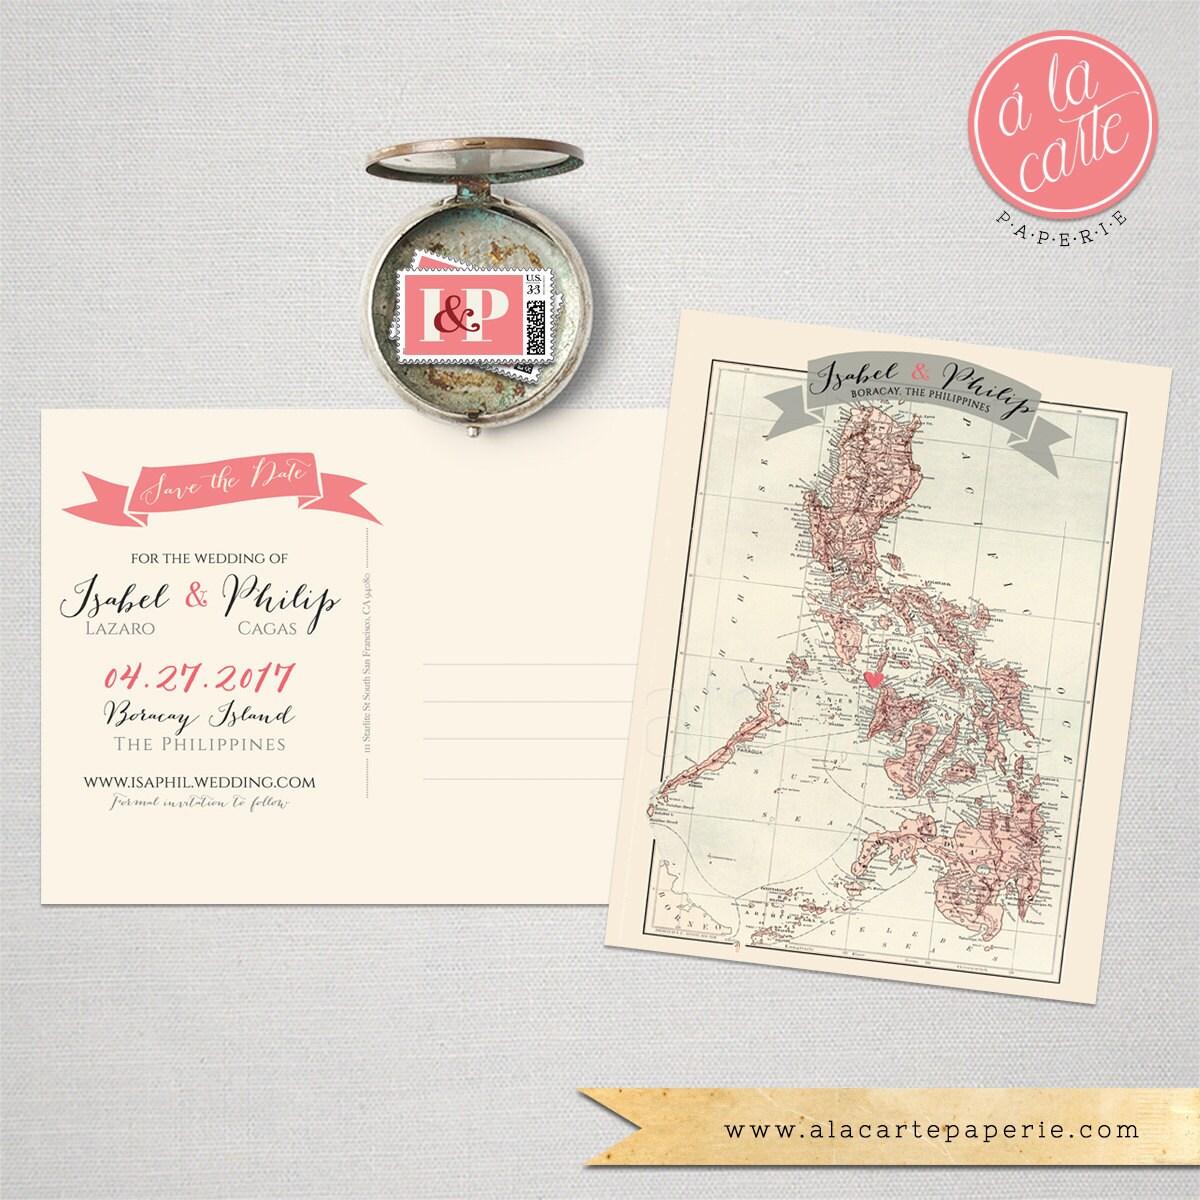 Destination wedding invitation The Philippines Boracay Manila | Etsy